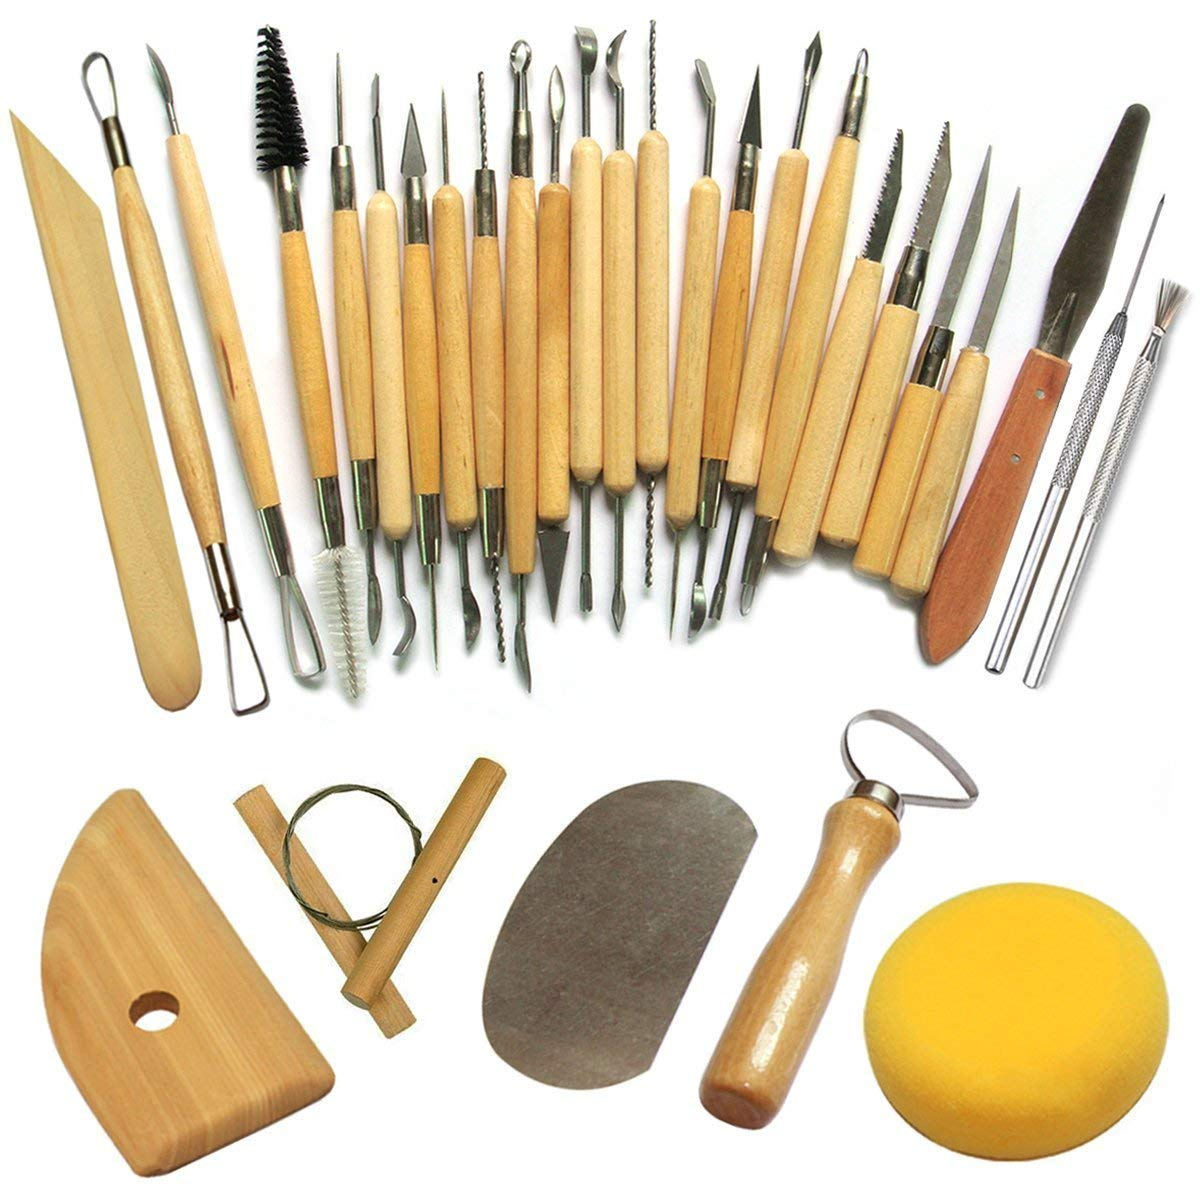 Set 30 Pcs herramientas modelado para escultura, arcilla, cerámica